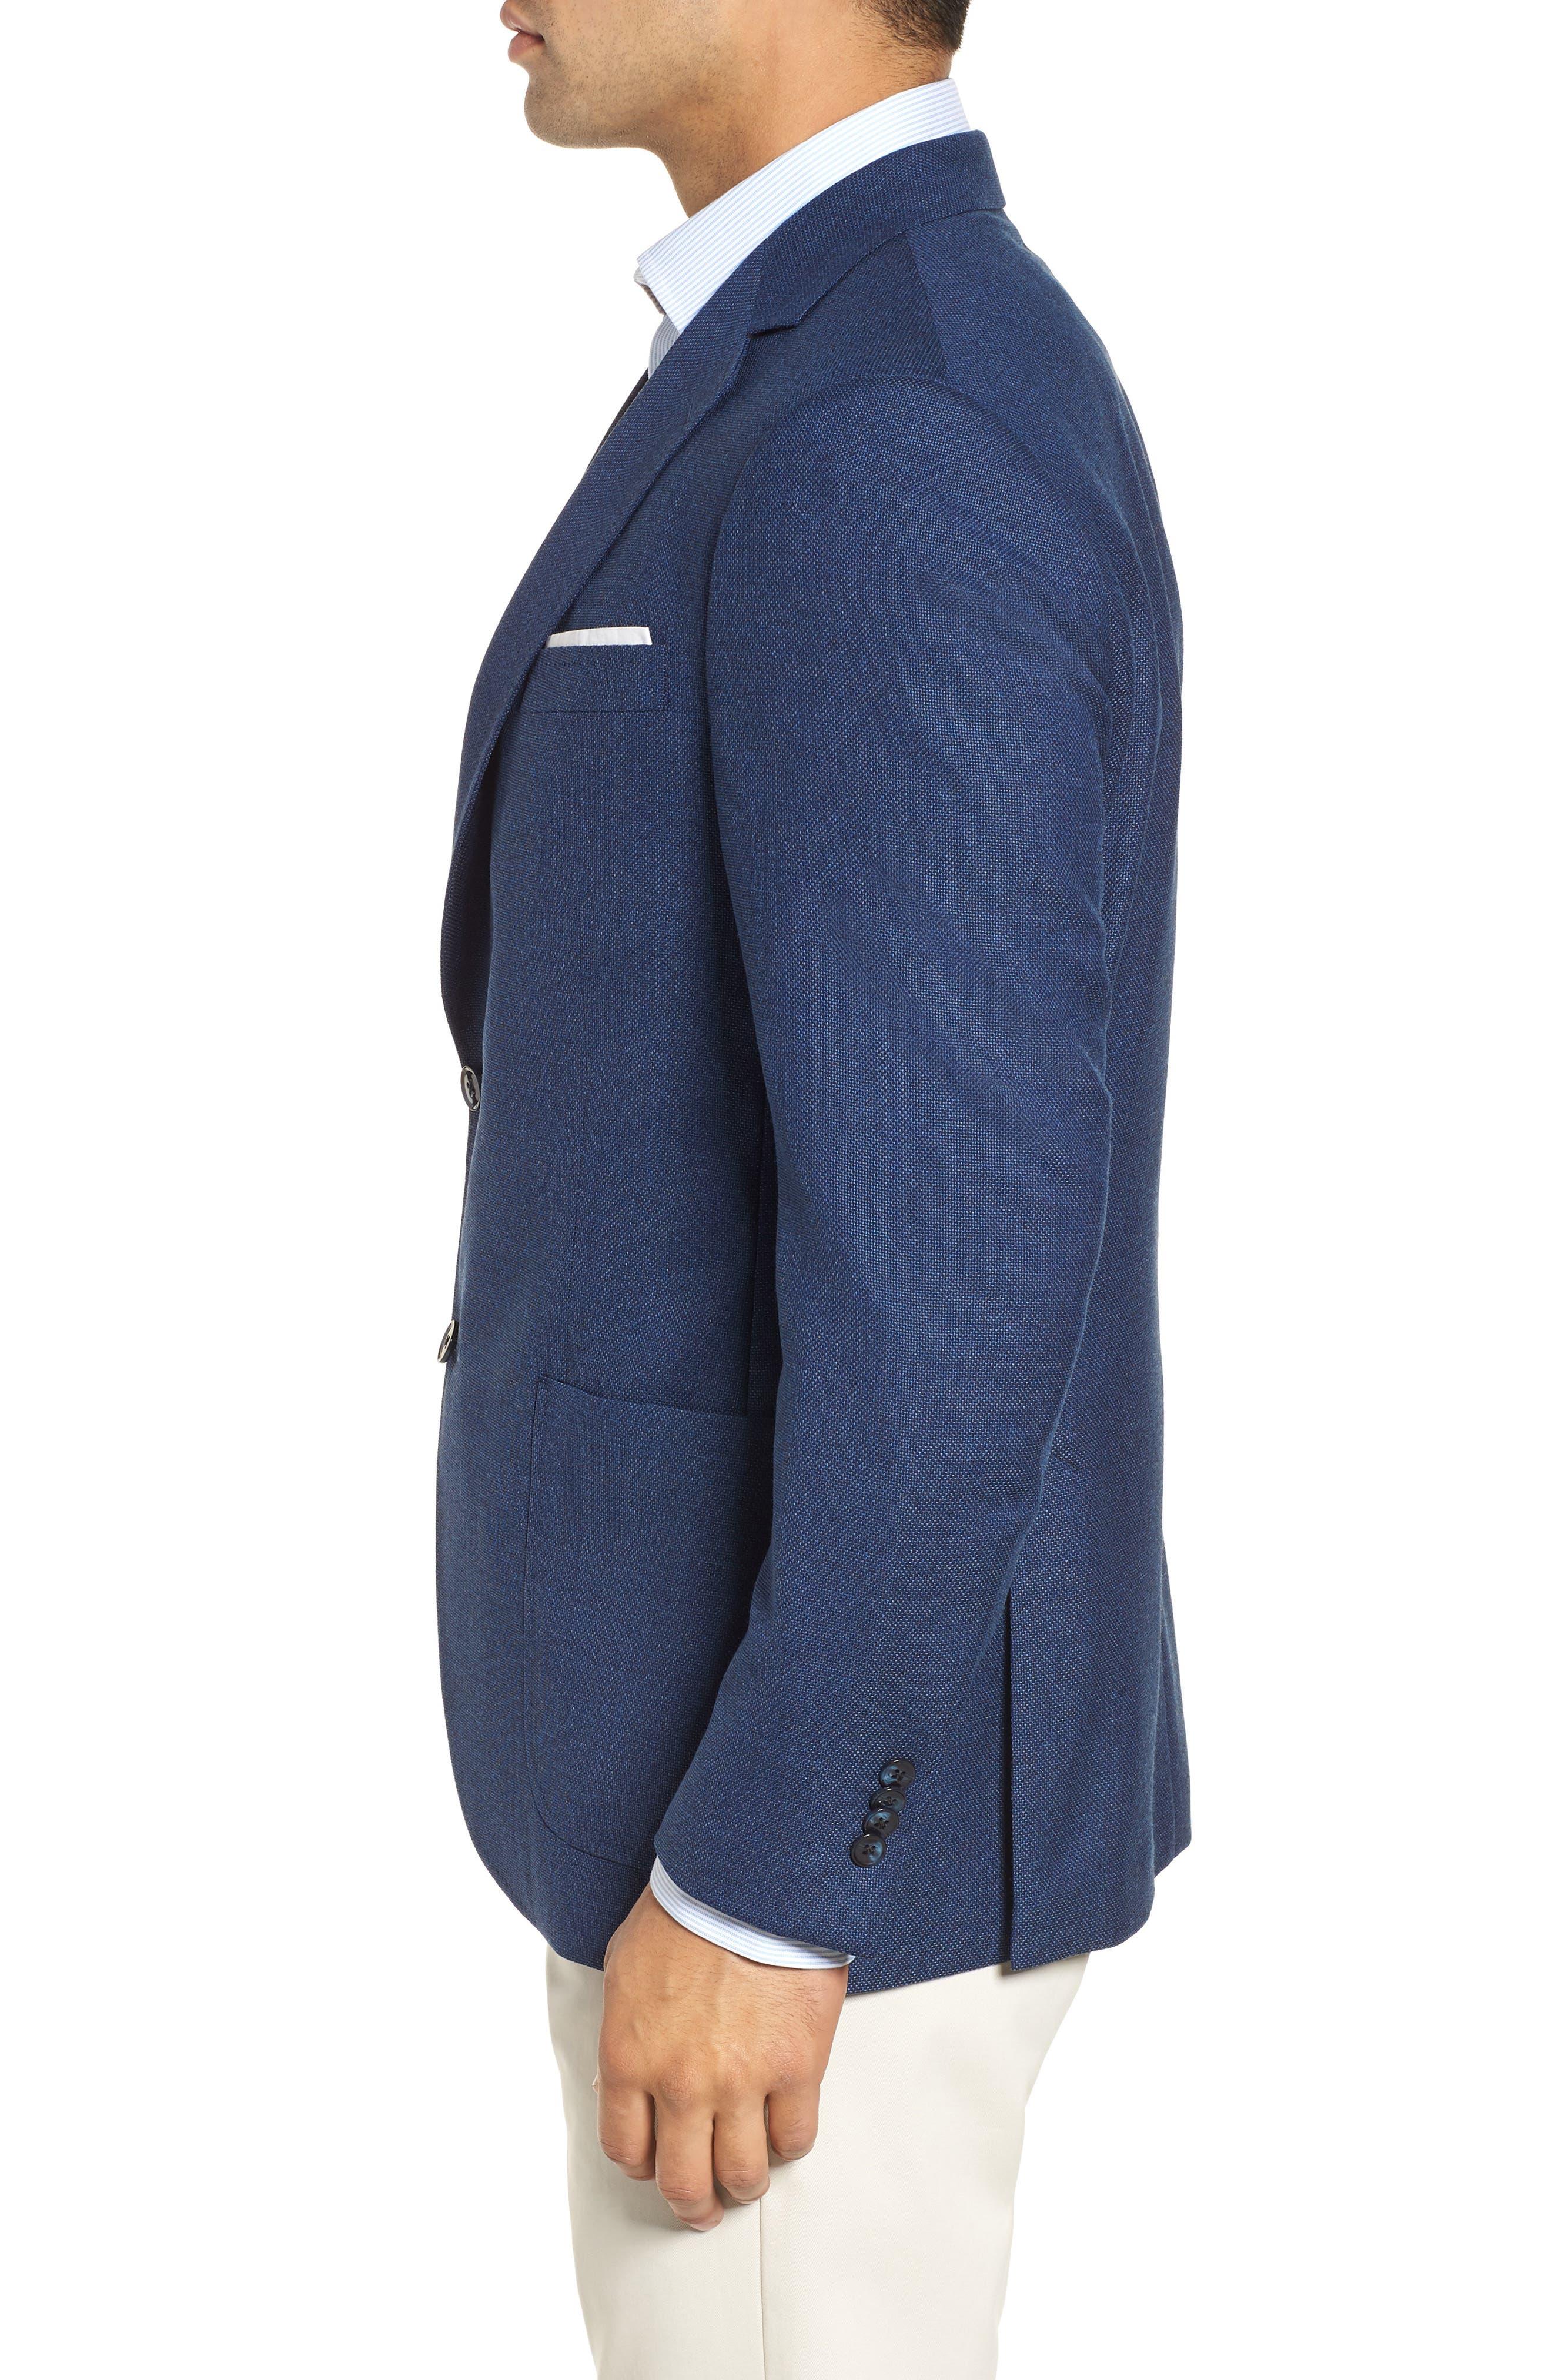 PETER MILLAR, Hyperlight Classic Fit Wool Sport Coat, Alternate thumbnail 3, color, 400